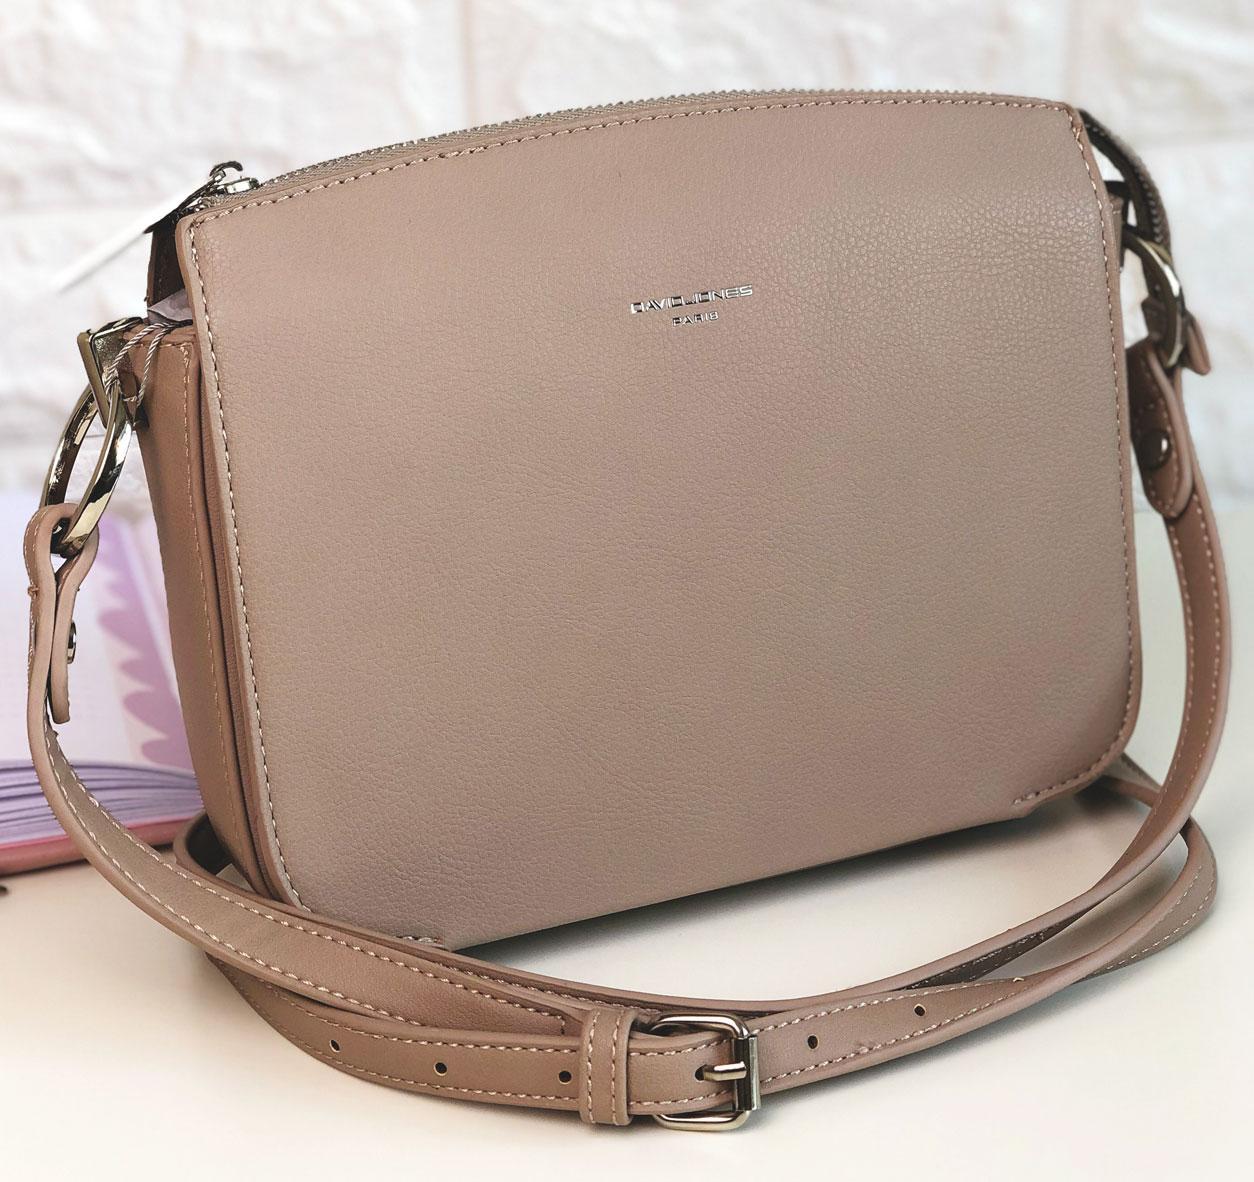 Жіноча сумка через плече David Jones СМ3598А Бежева